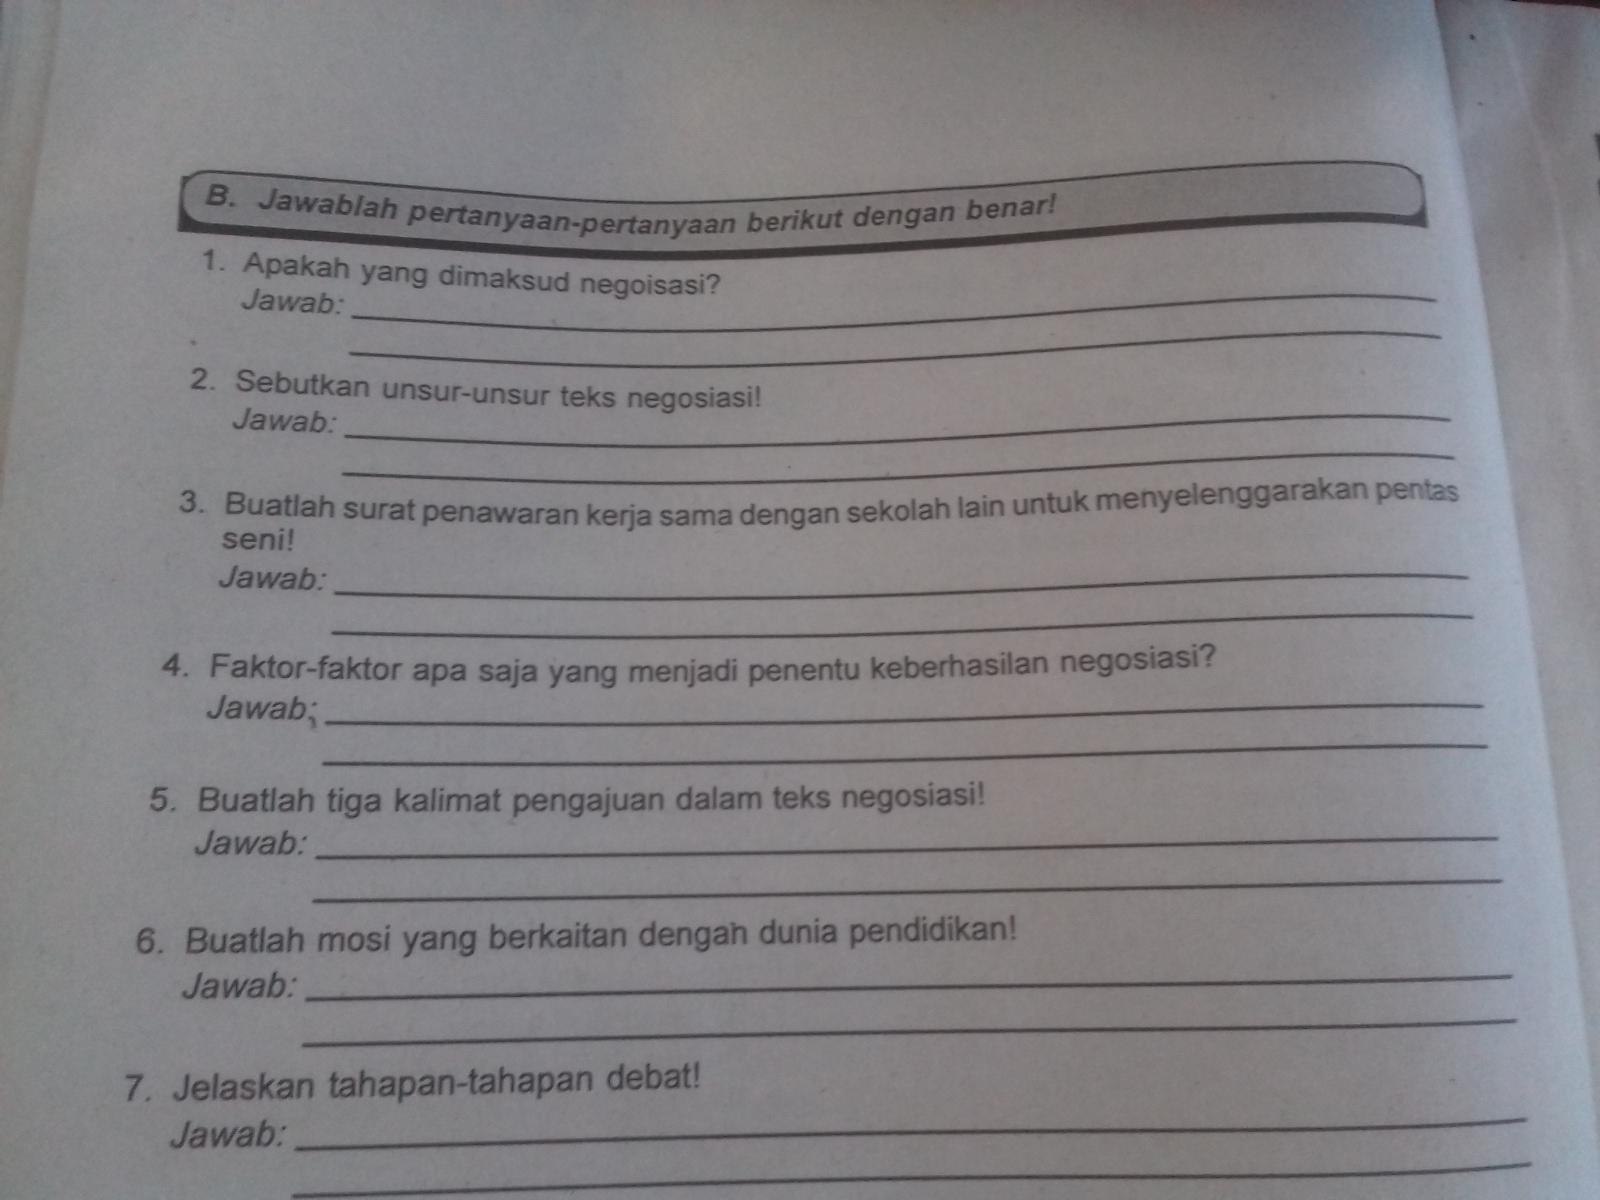 No 3 Tolong Dibantu Bsk Dikumpulkan Brainly Co Id